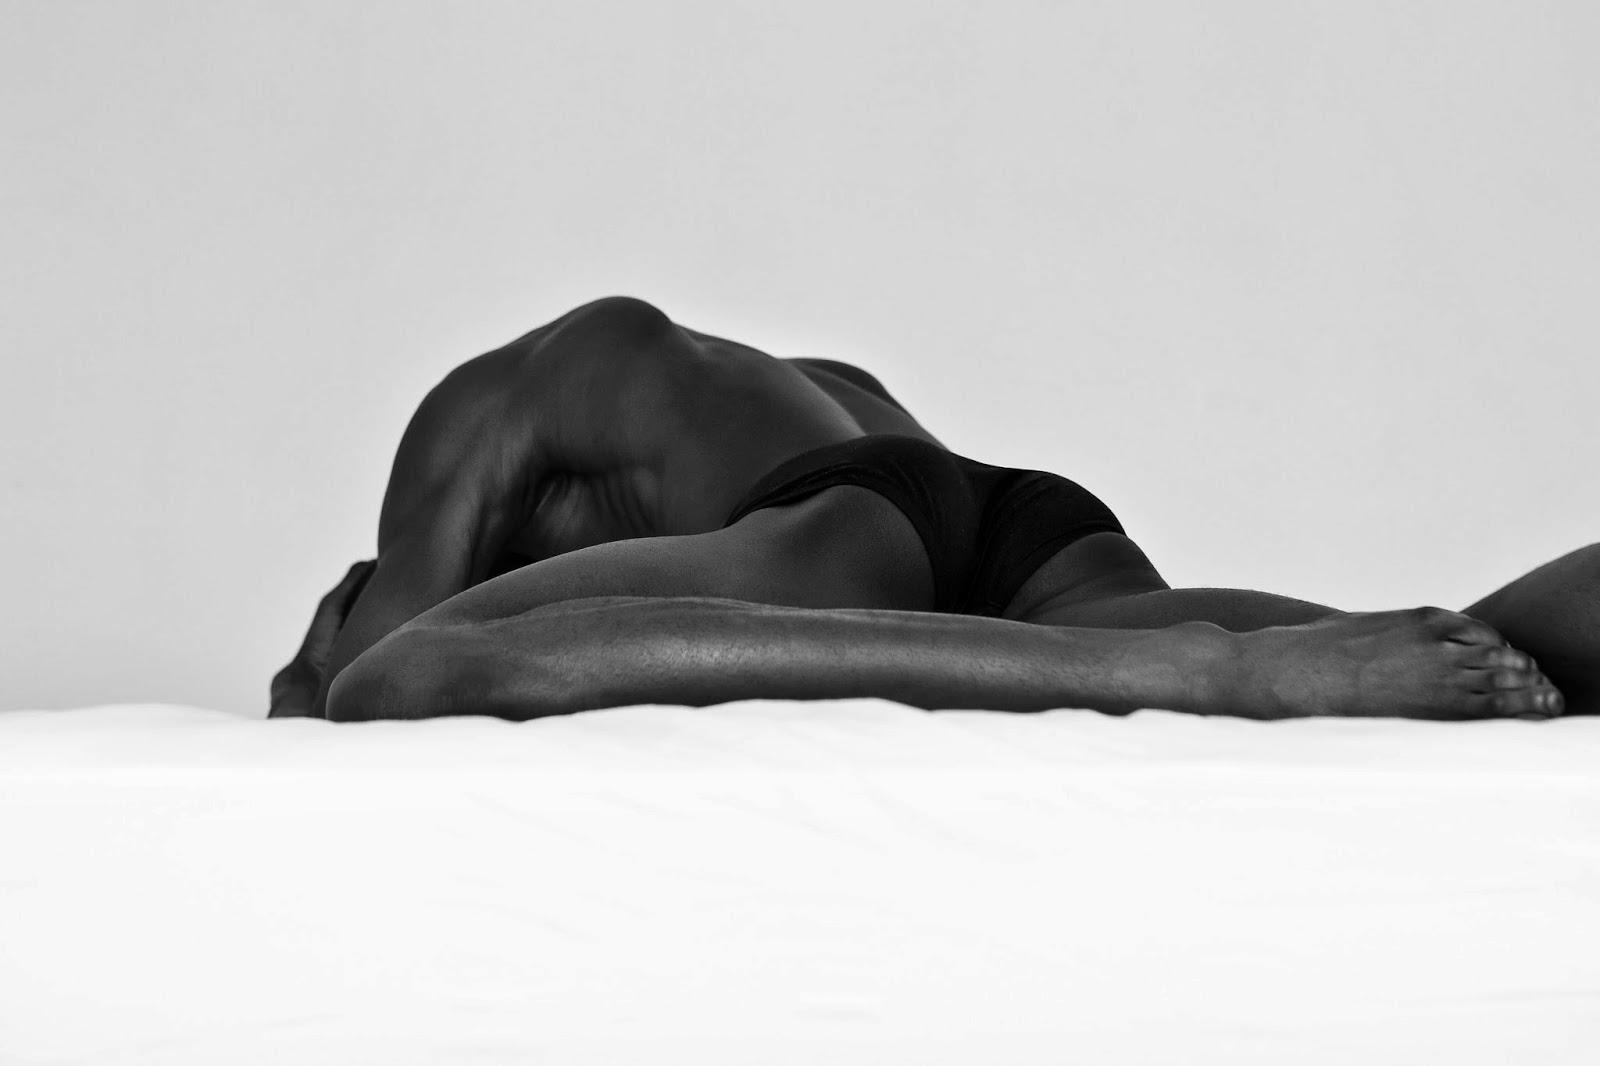 ADONIS B. (MAJOR MODEL) para Horizon exhibition by Rainer Torrado 2 ADONIS B. (MAJOR MODEL) para Horizon exhibition by Rainer Torrado